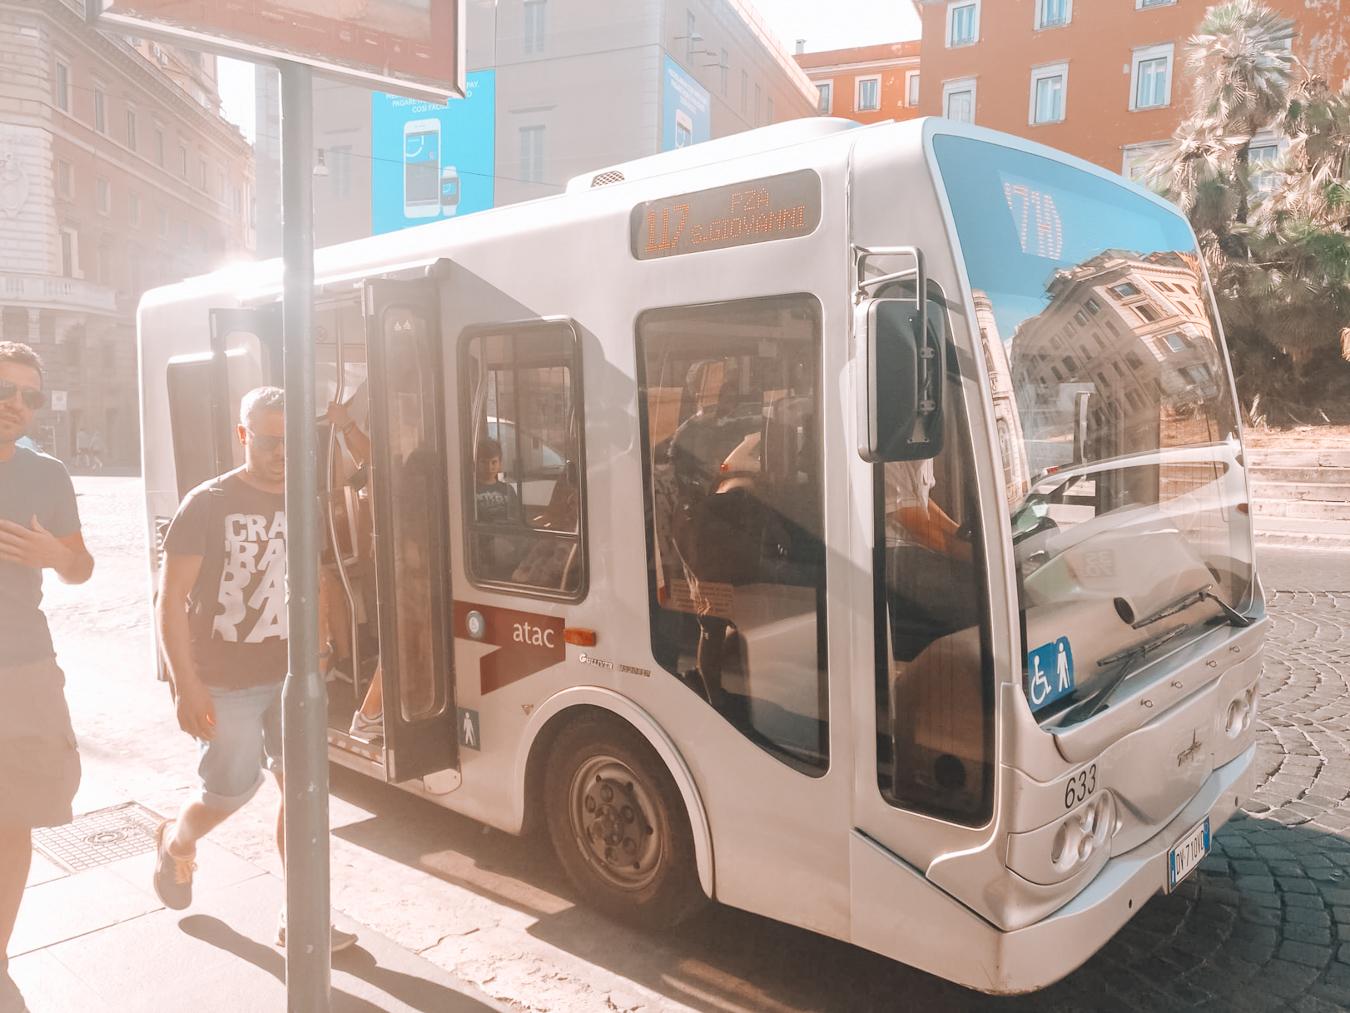 Bus in Rome